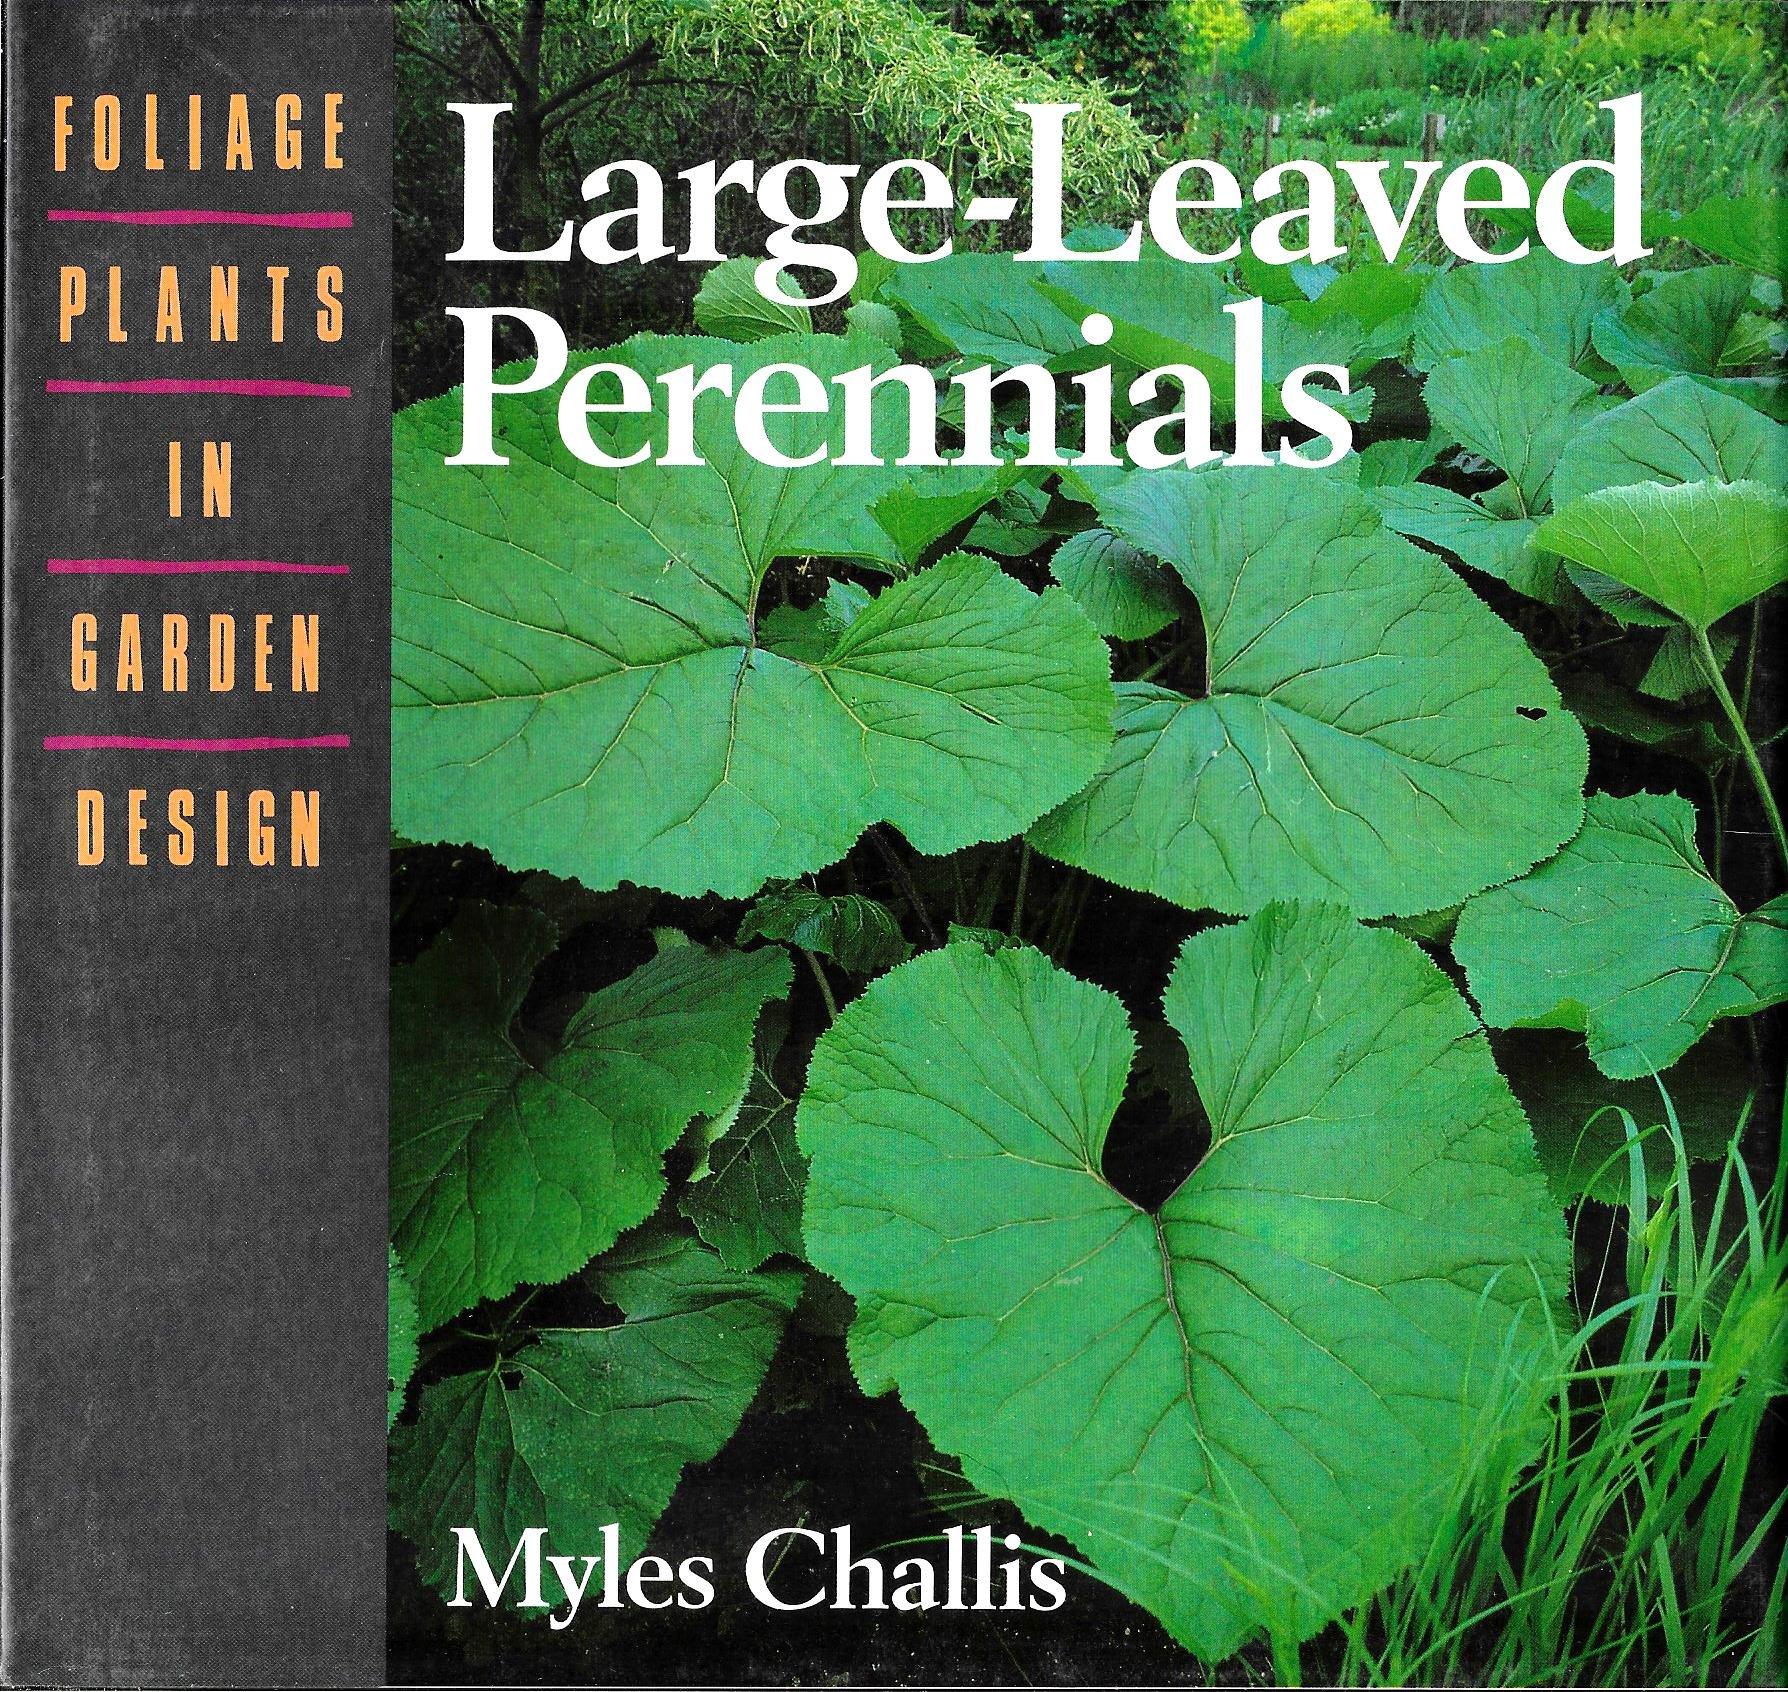 Large Leaved Perennials Foliage Plants In Garden Design Myles